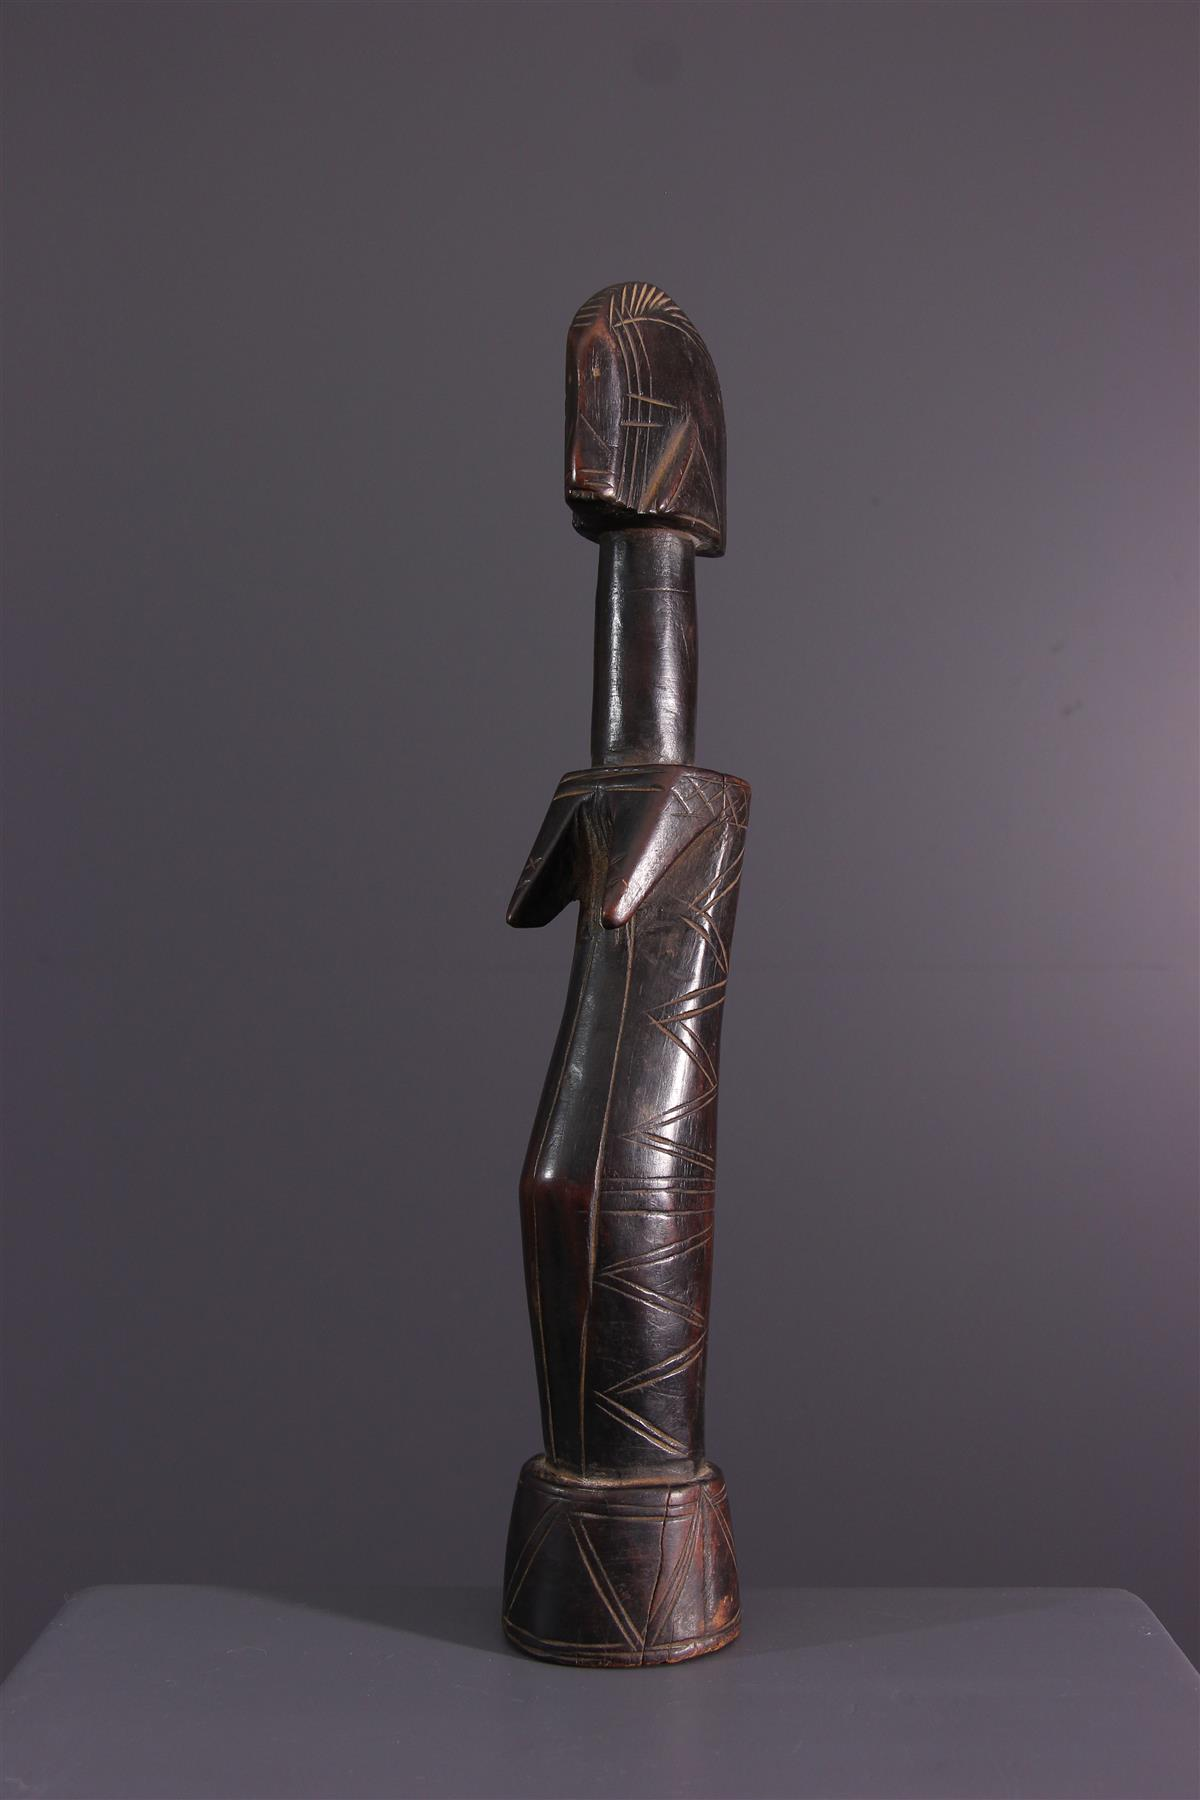 Mossi pop - Afrikaanse kunst